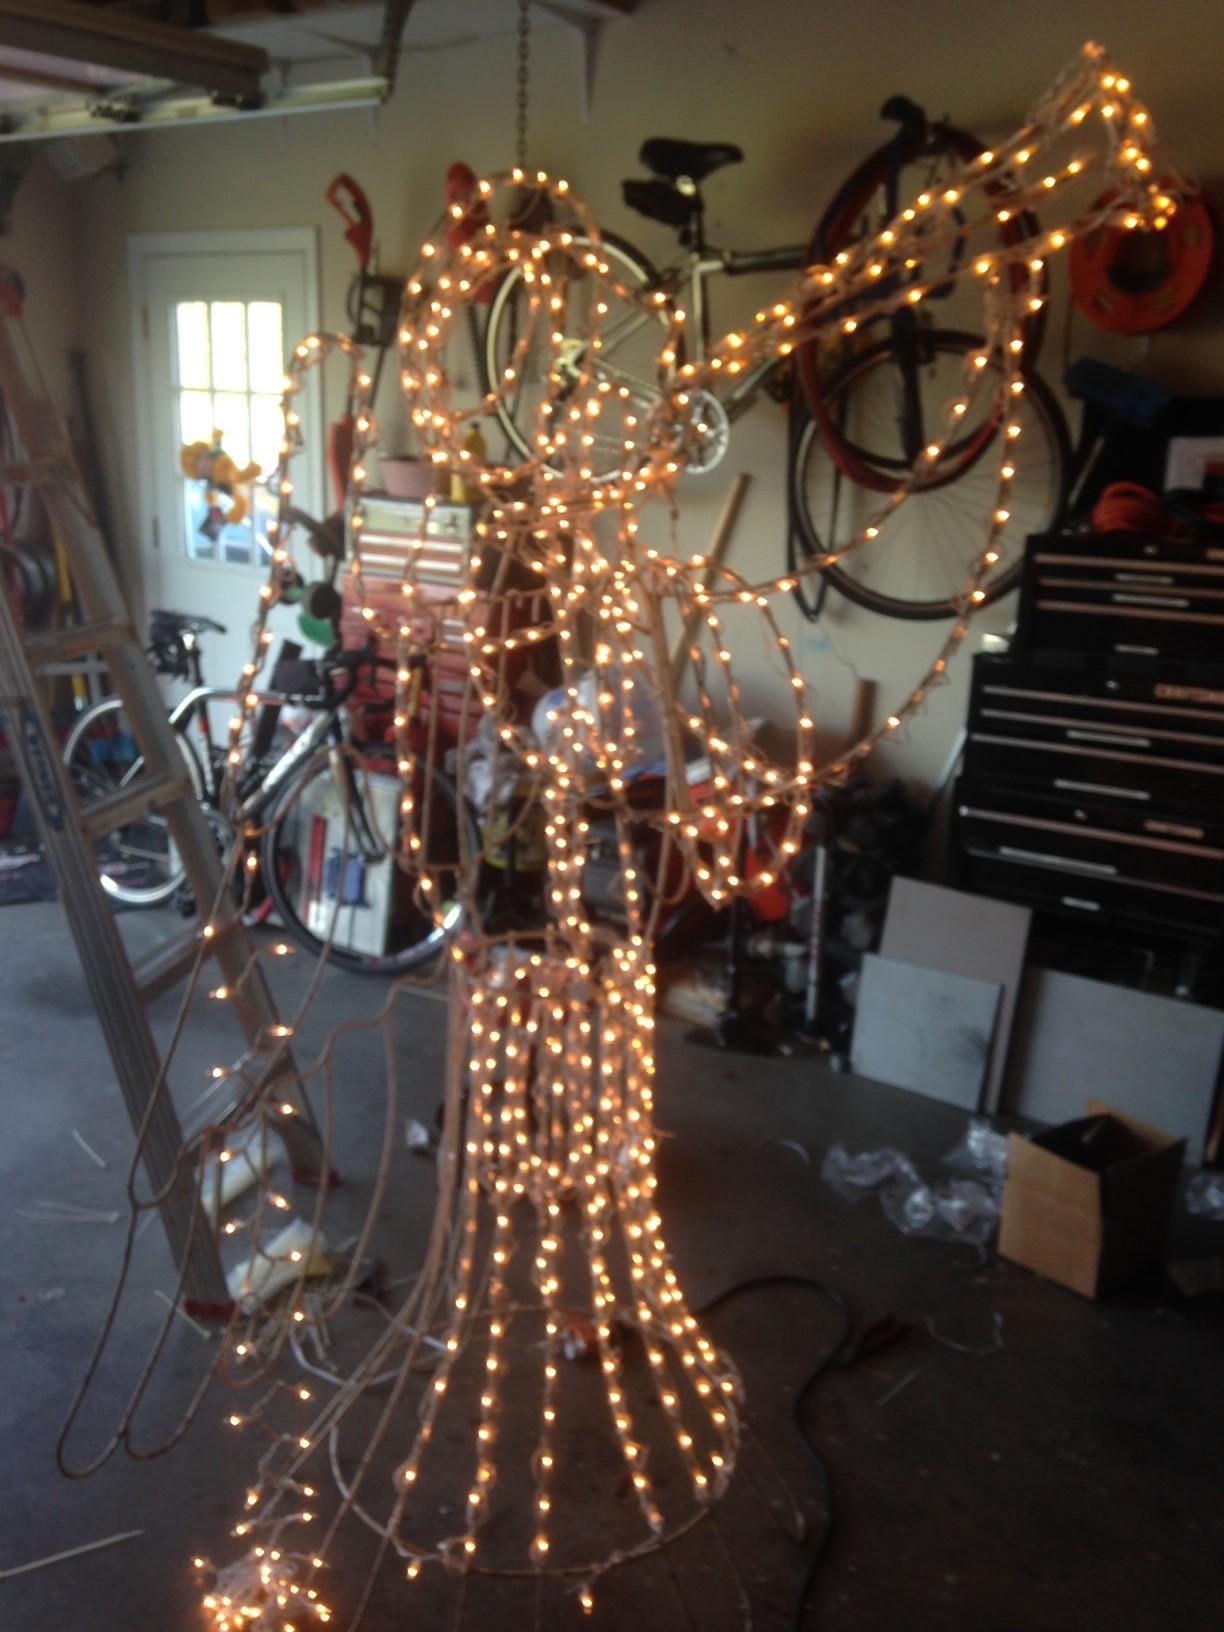 Repairing Christmas Lights